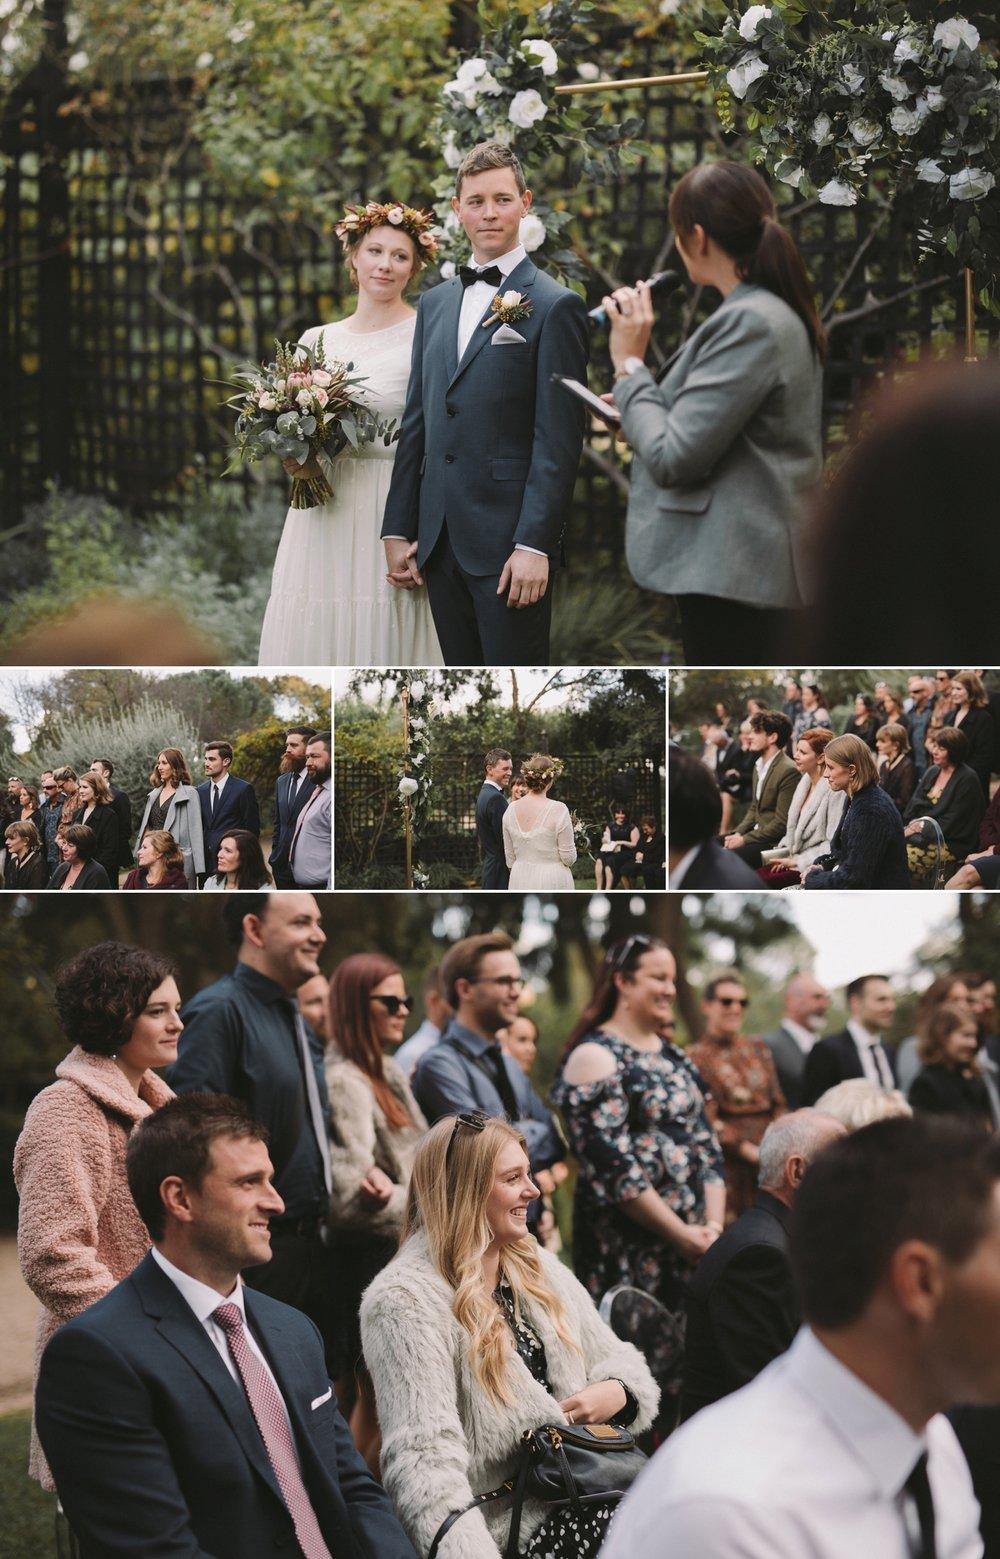 Jo & Aaron - Natural Wedding Photography in Adelaide - Beautiful, modern wedding photographer - Al Ru Farm Wedding Photography - Katherine Schultz_0013.jpg